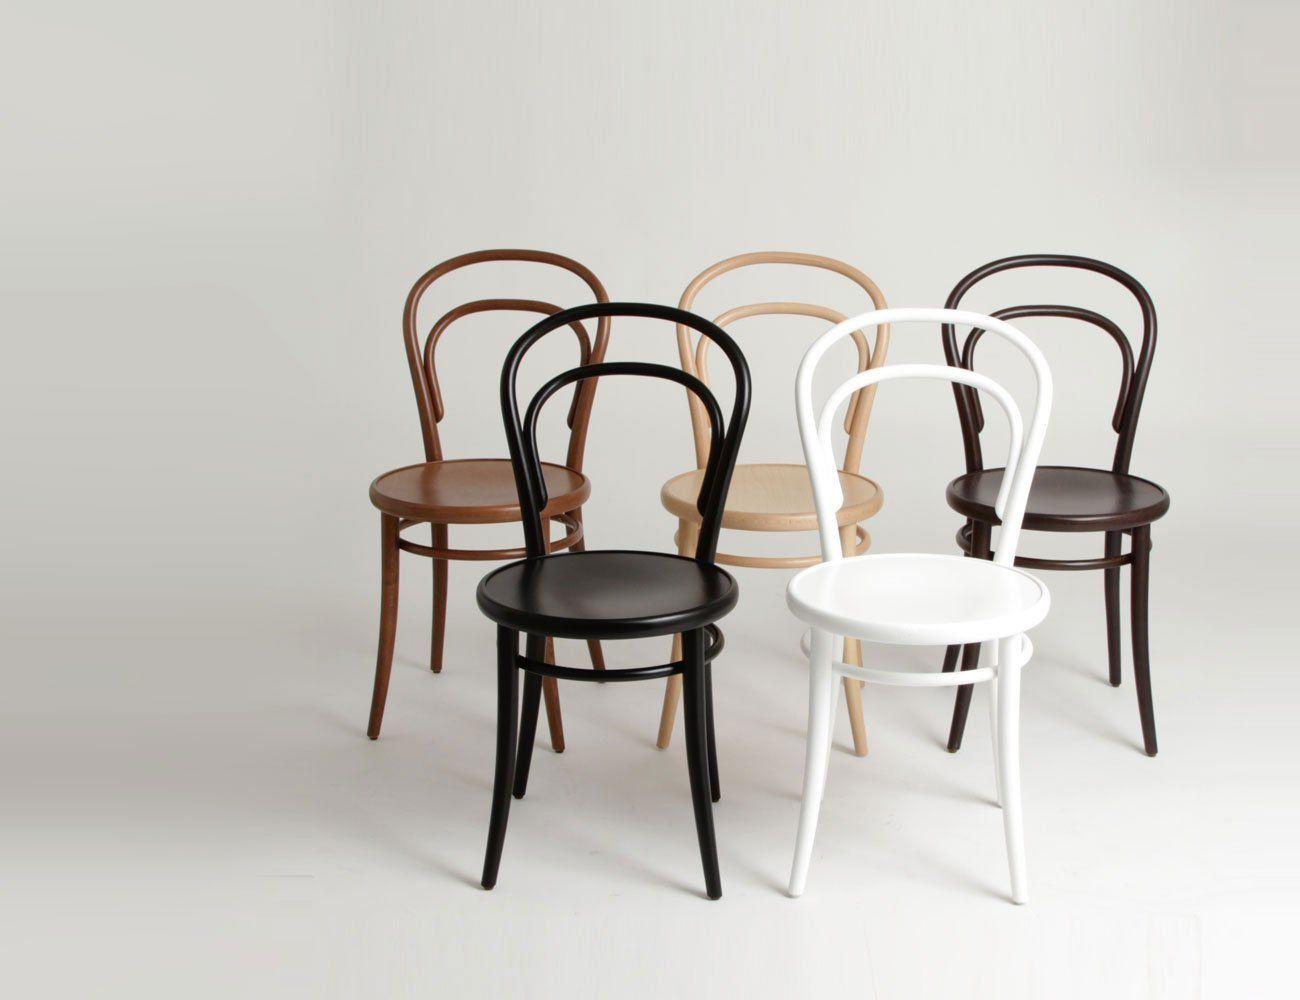 thonet no 14 coffee esszimmer. Black Bedroom Furniture Sets. Home Design Ideas